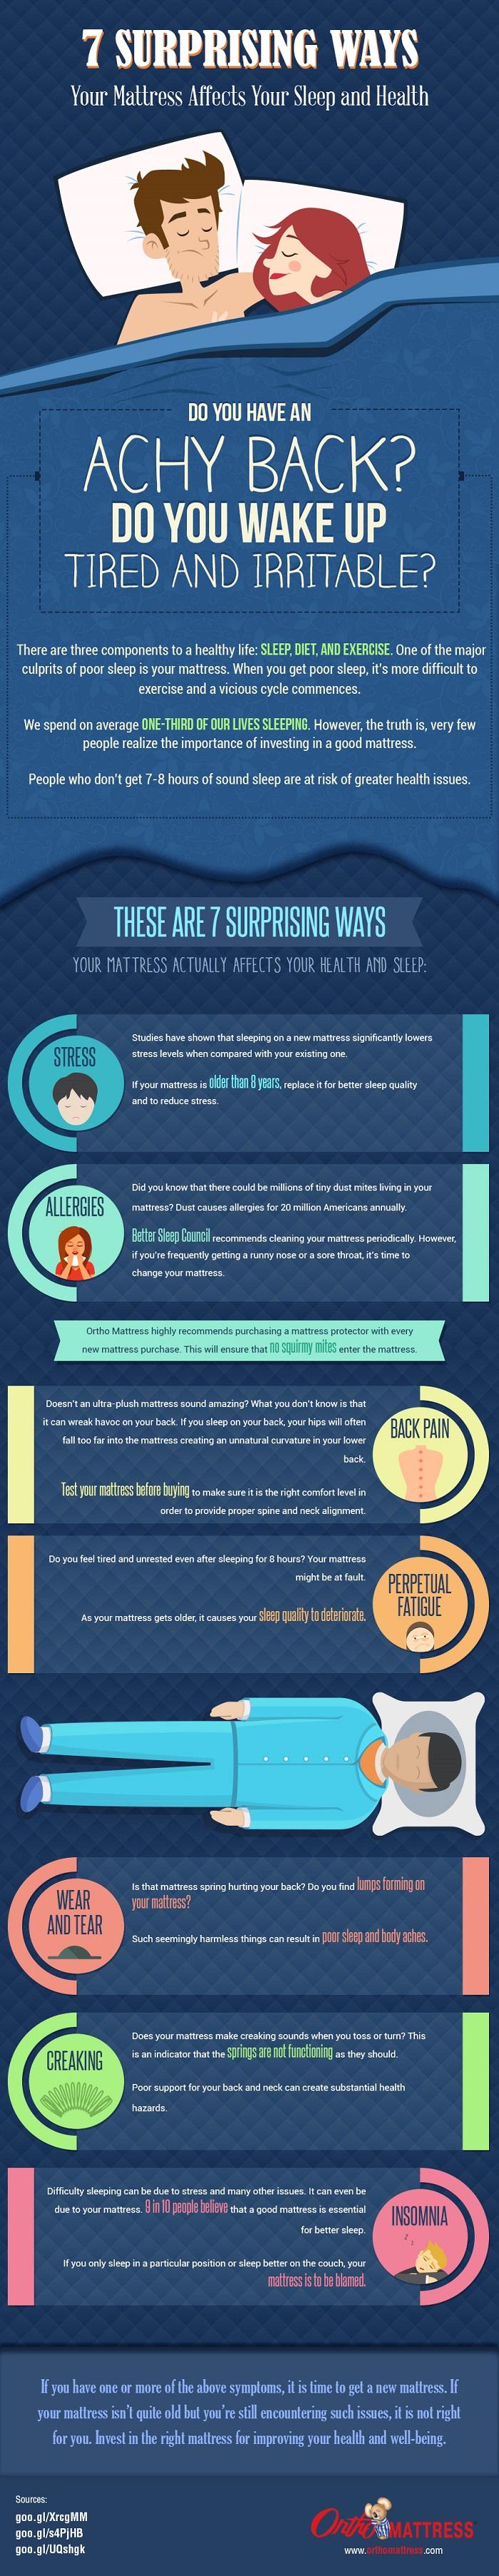 sleep and health tips